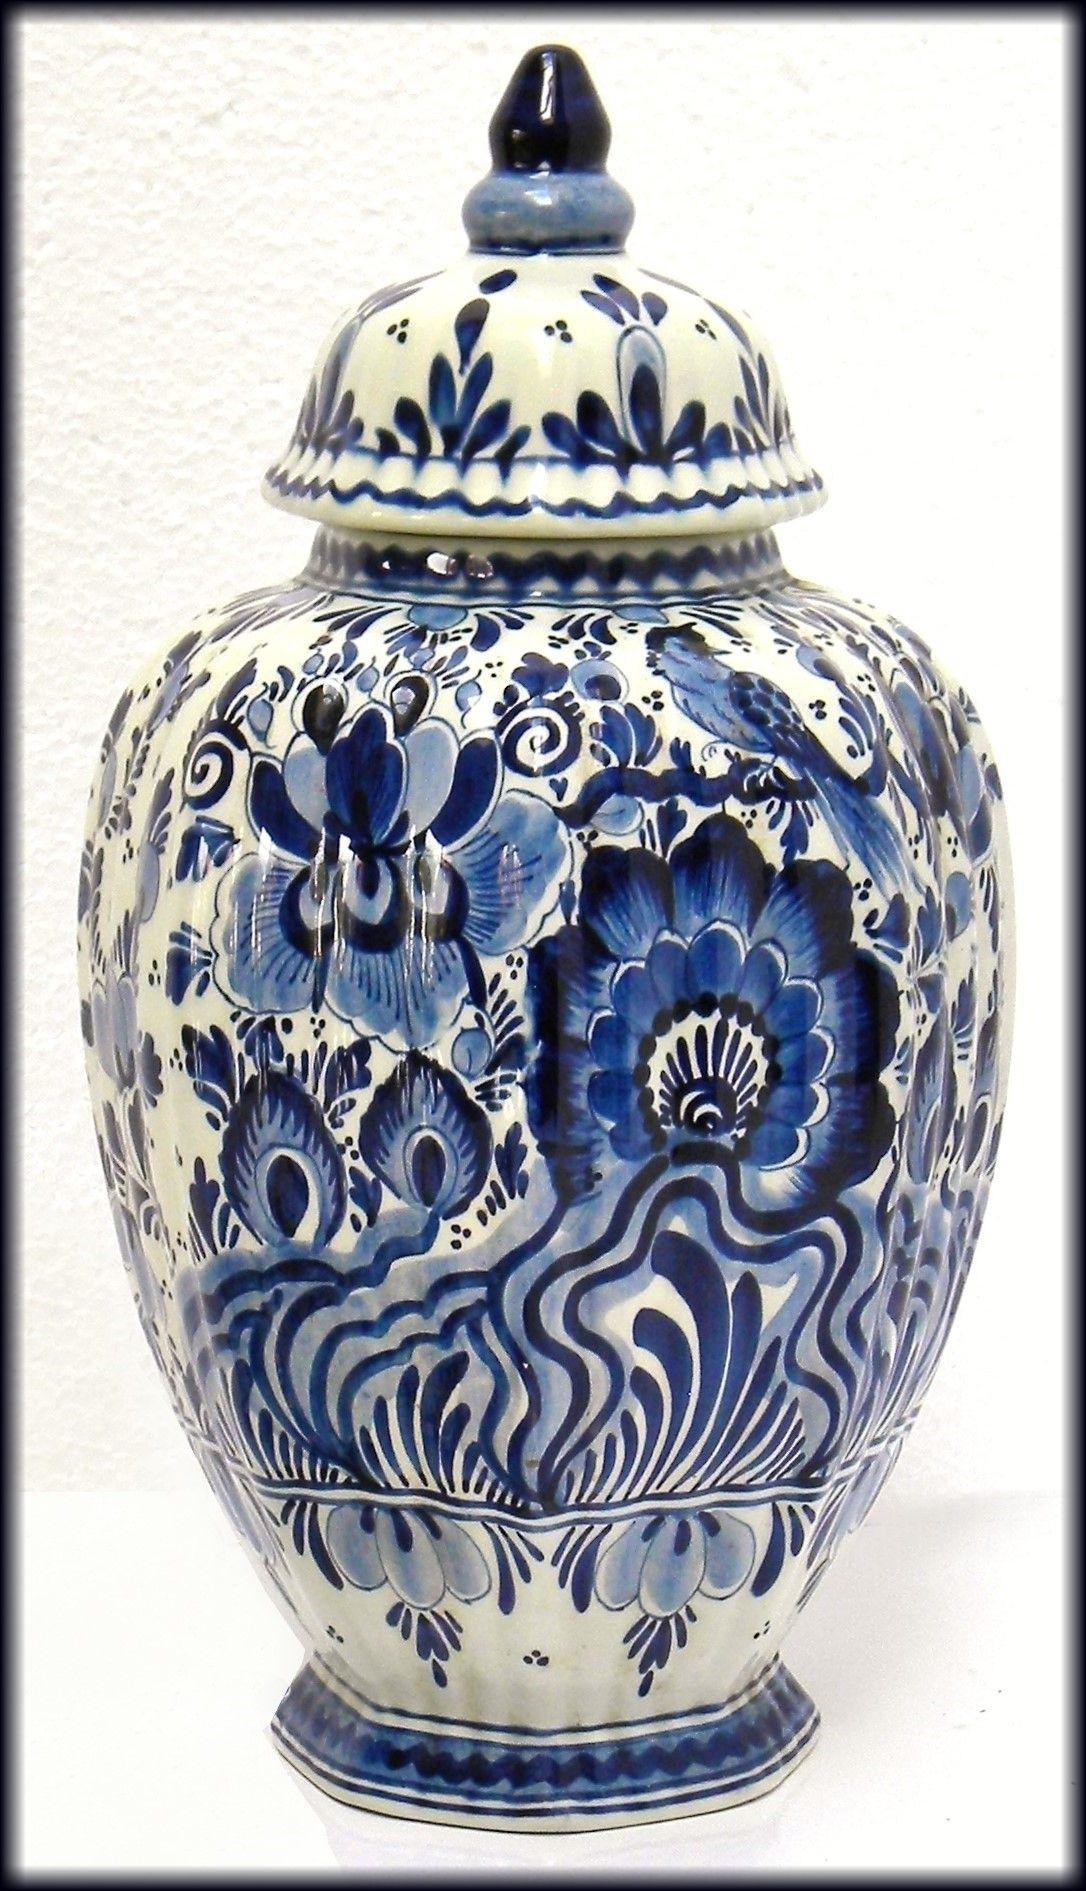 delft blue vase of vintage delft blue ceramic vase jar hand painted cobalt blue floral with regard to amazing delft blue vintage dutch art pottery with cobalt blue bird and floral decoration